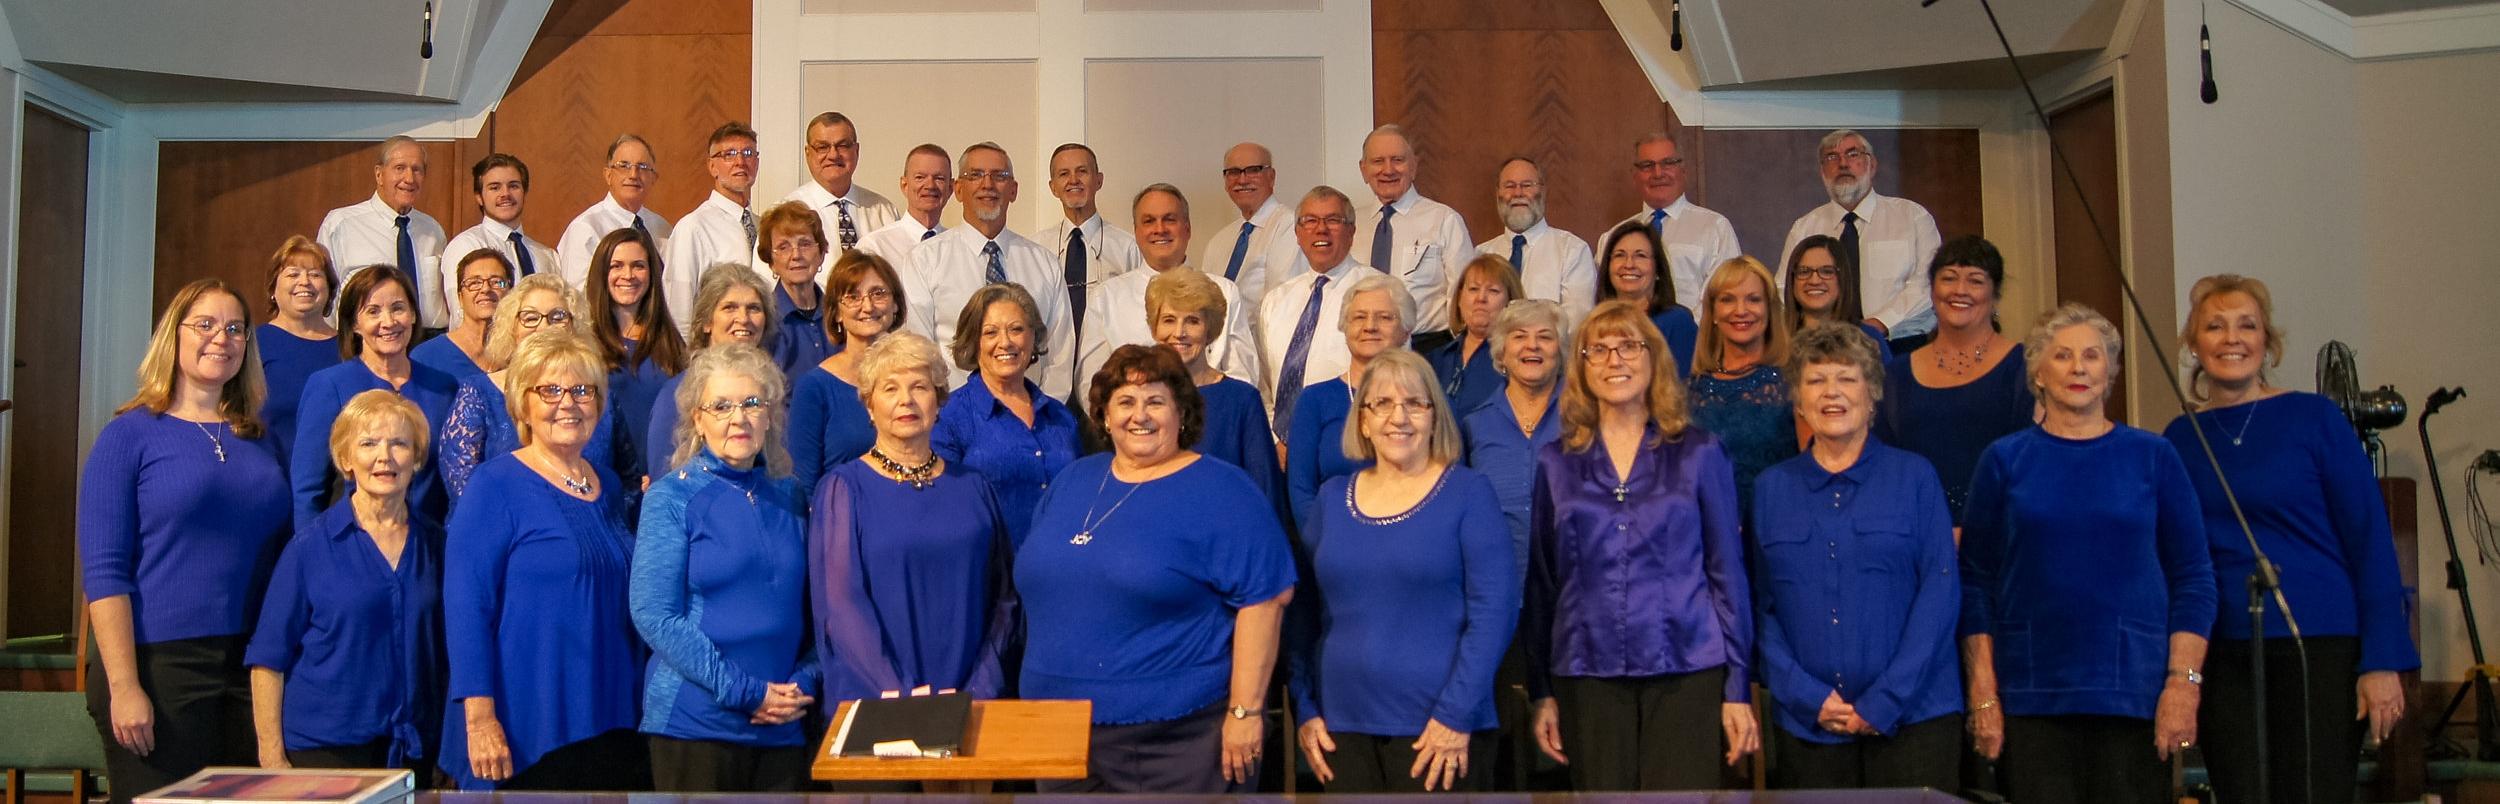 SLUMC Chancel Choir 12.2017 DSC00597 (1).jpg